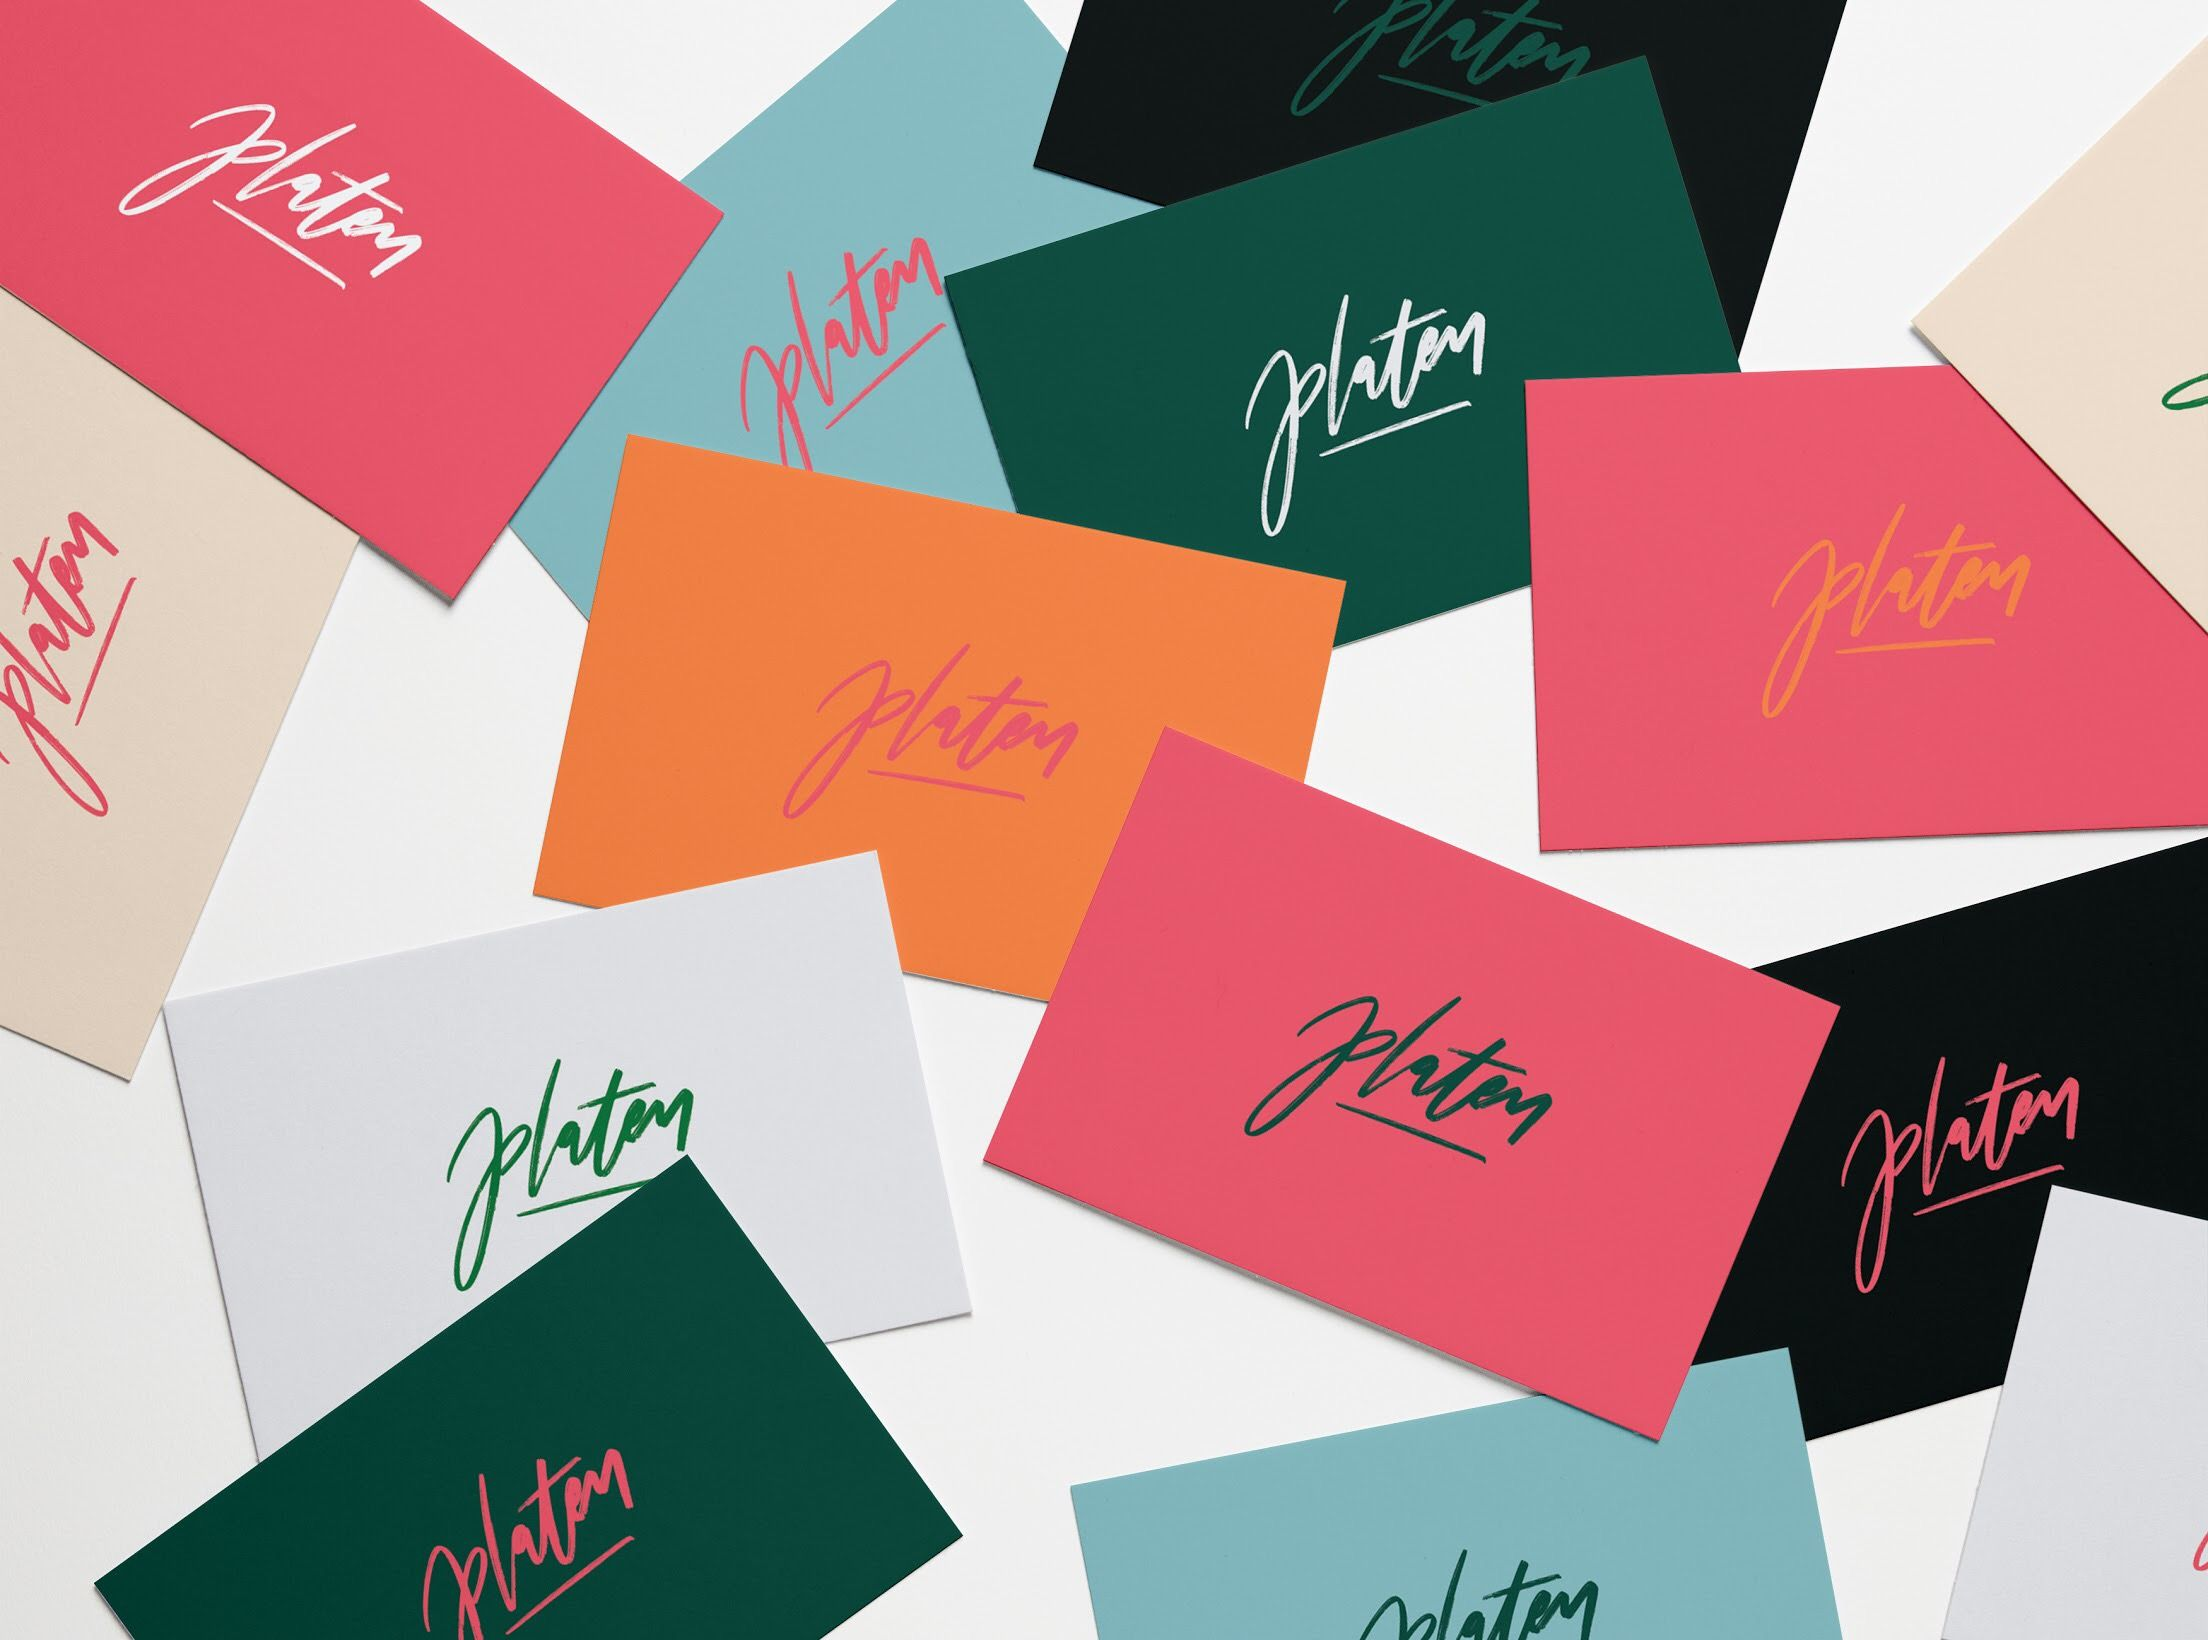 Platen Magazine Branding Business Card Design   Design   Pinterest ...